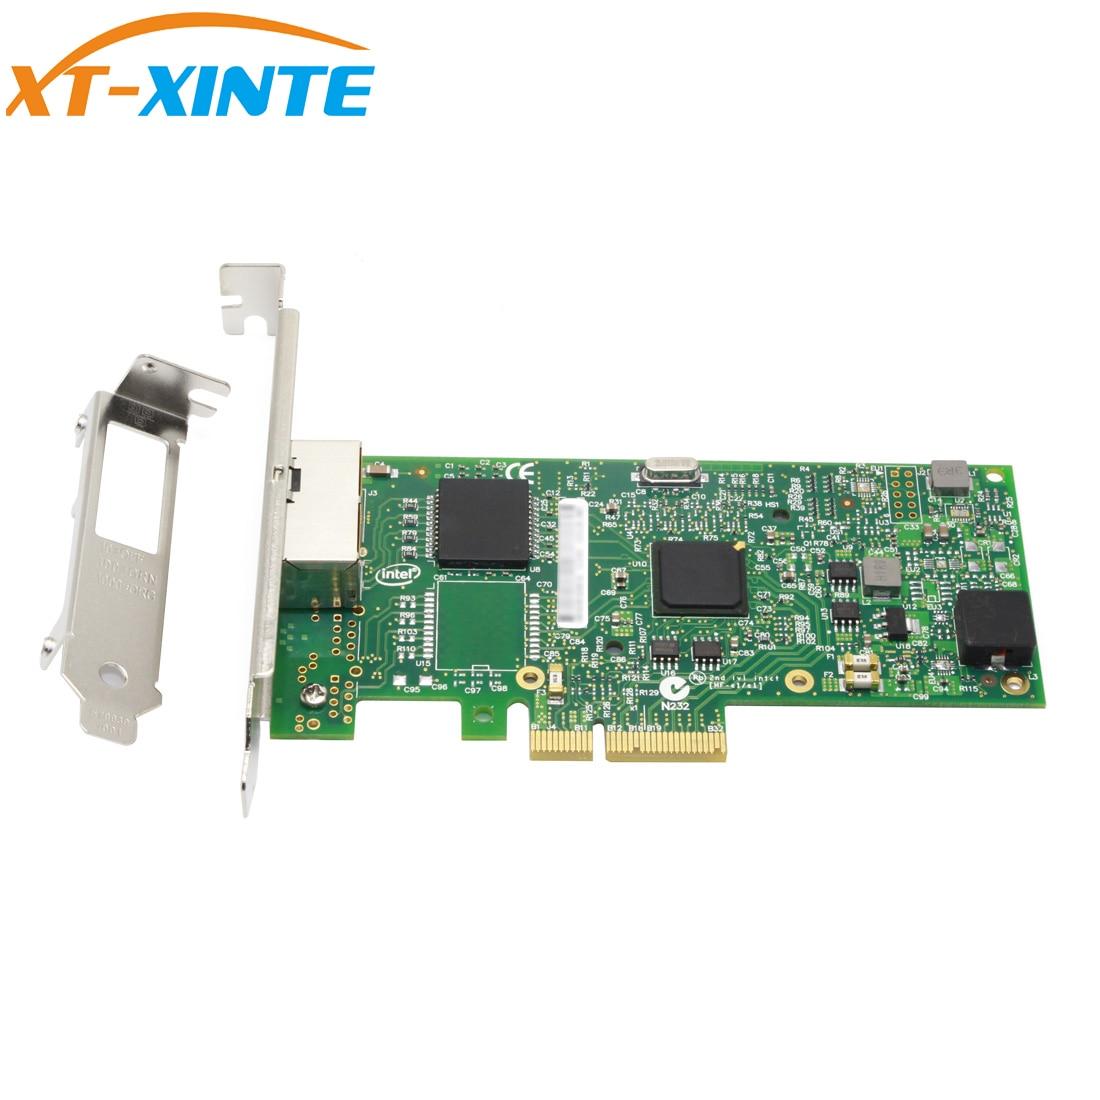 Placa de Rede Mbps para Conversor Pci-e Servidor Duplo Rj45 Porta Gigabit Ethernet Lan Pcie Adaptador 10 – 100 1000 Intel I350-am2 4x